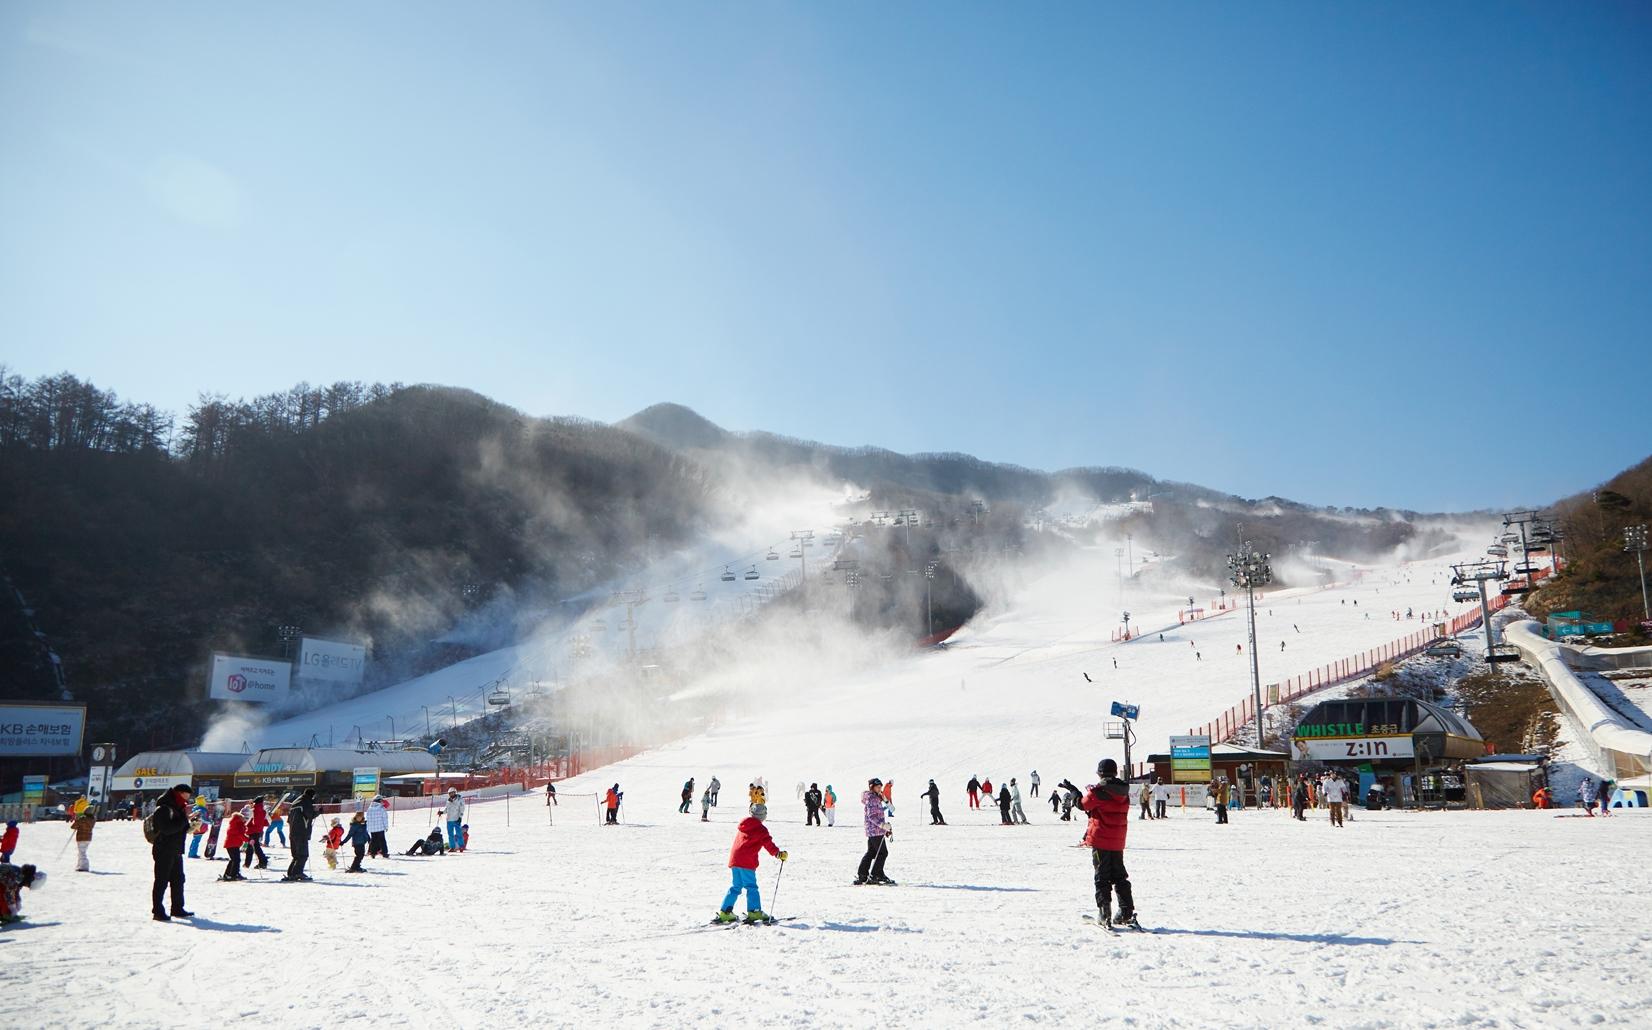 【KONJIAM RESORT】首爾附近最大滑雪場│首爾/京畿道自由行套票3-31天